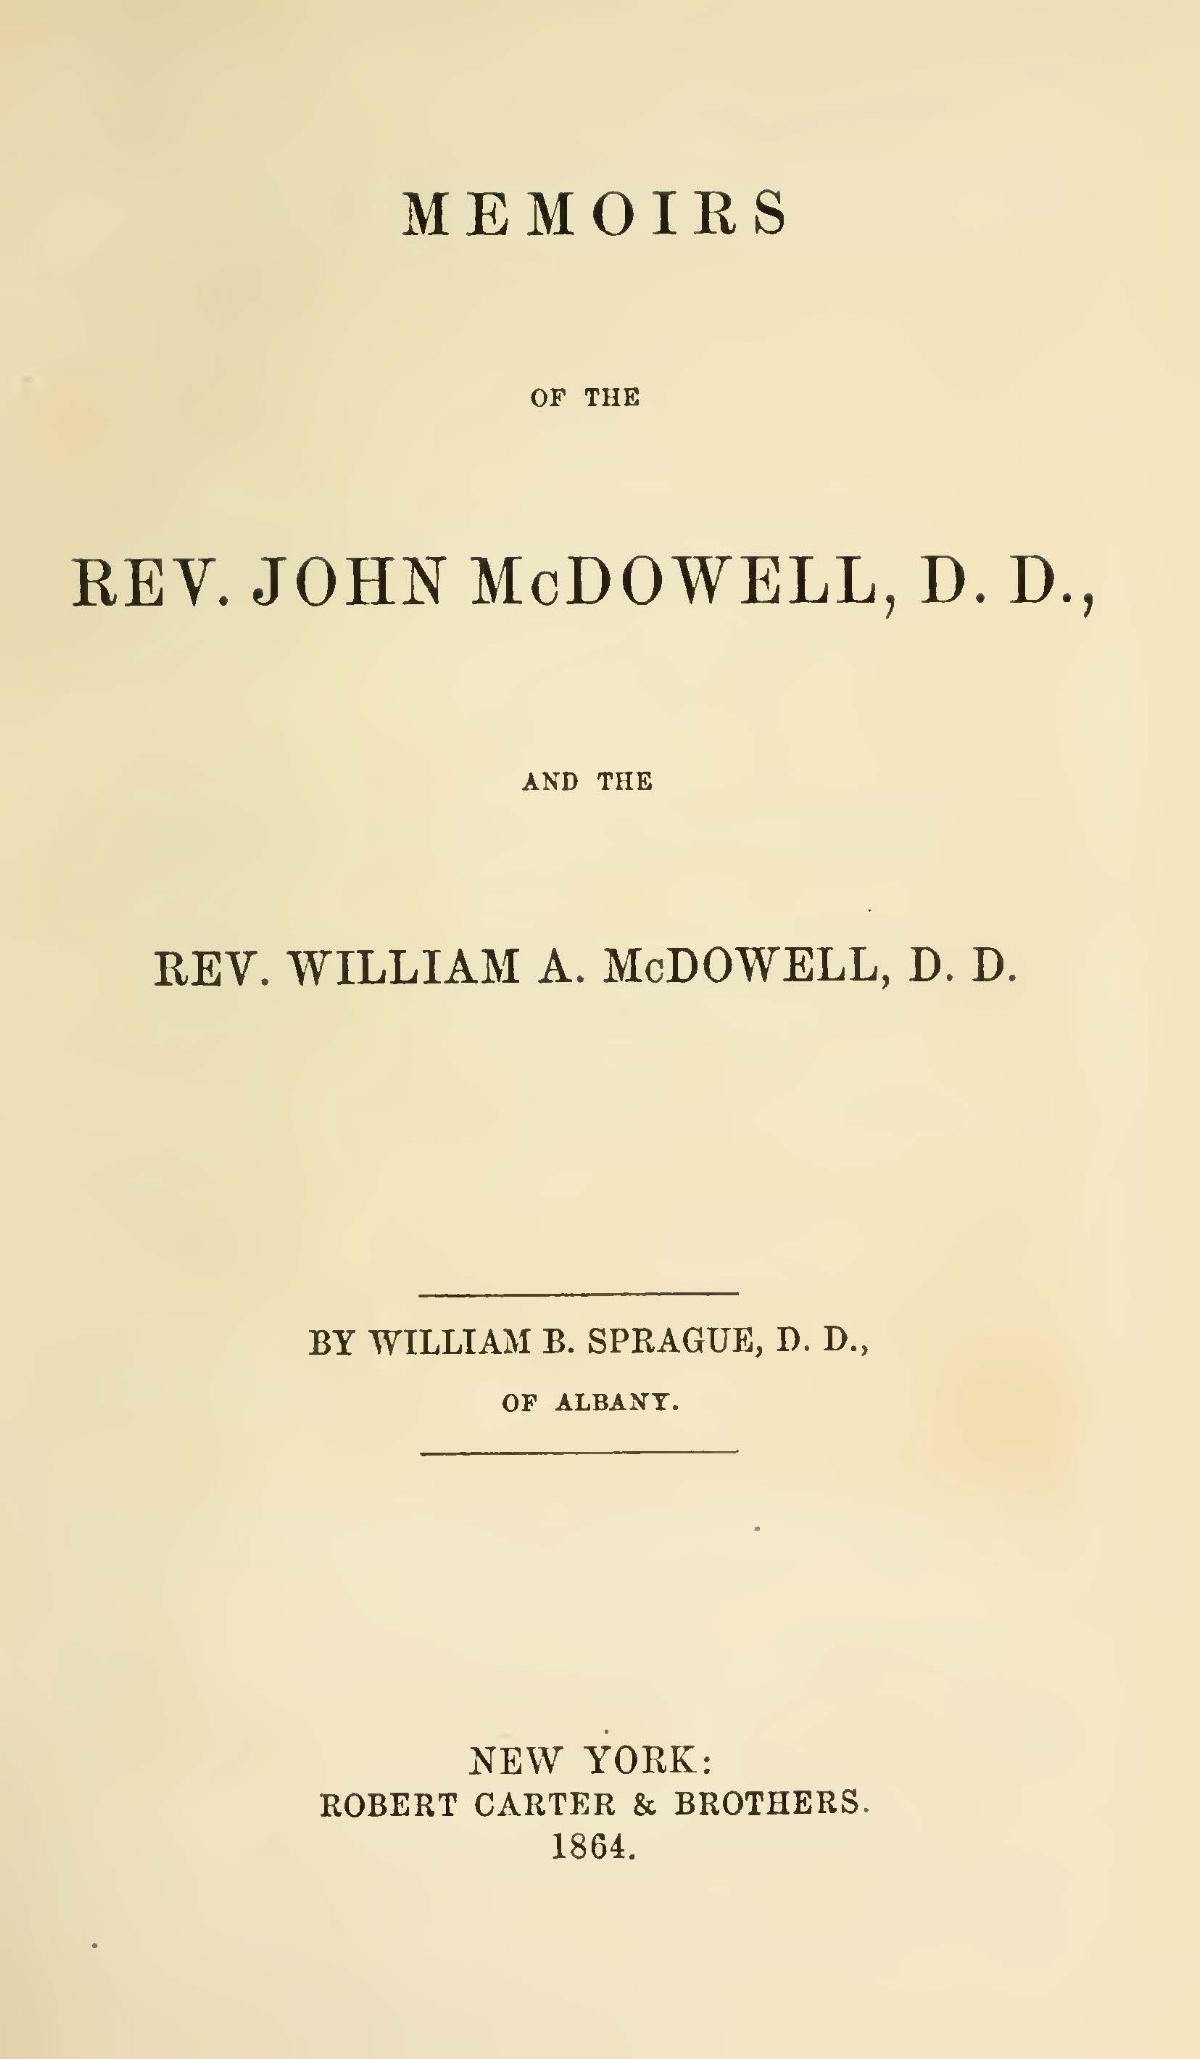 Sprague, William Buell, Memoirs of the Rev. John McDowell, D.D., and the Rev. William A. McDowell, D.D. Title Page.jpg